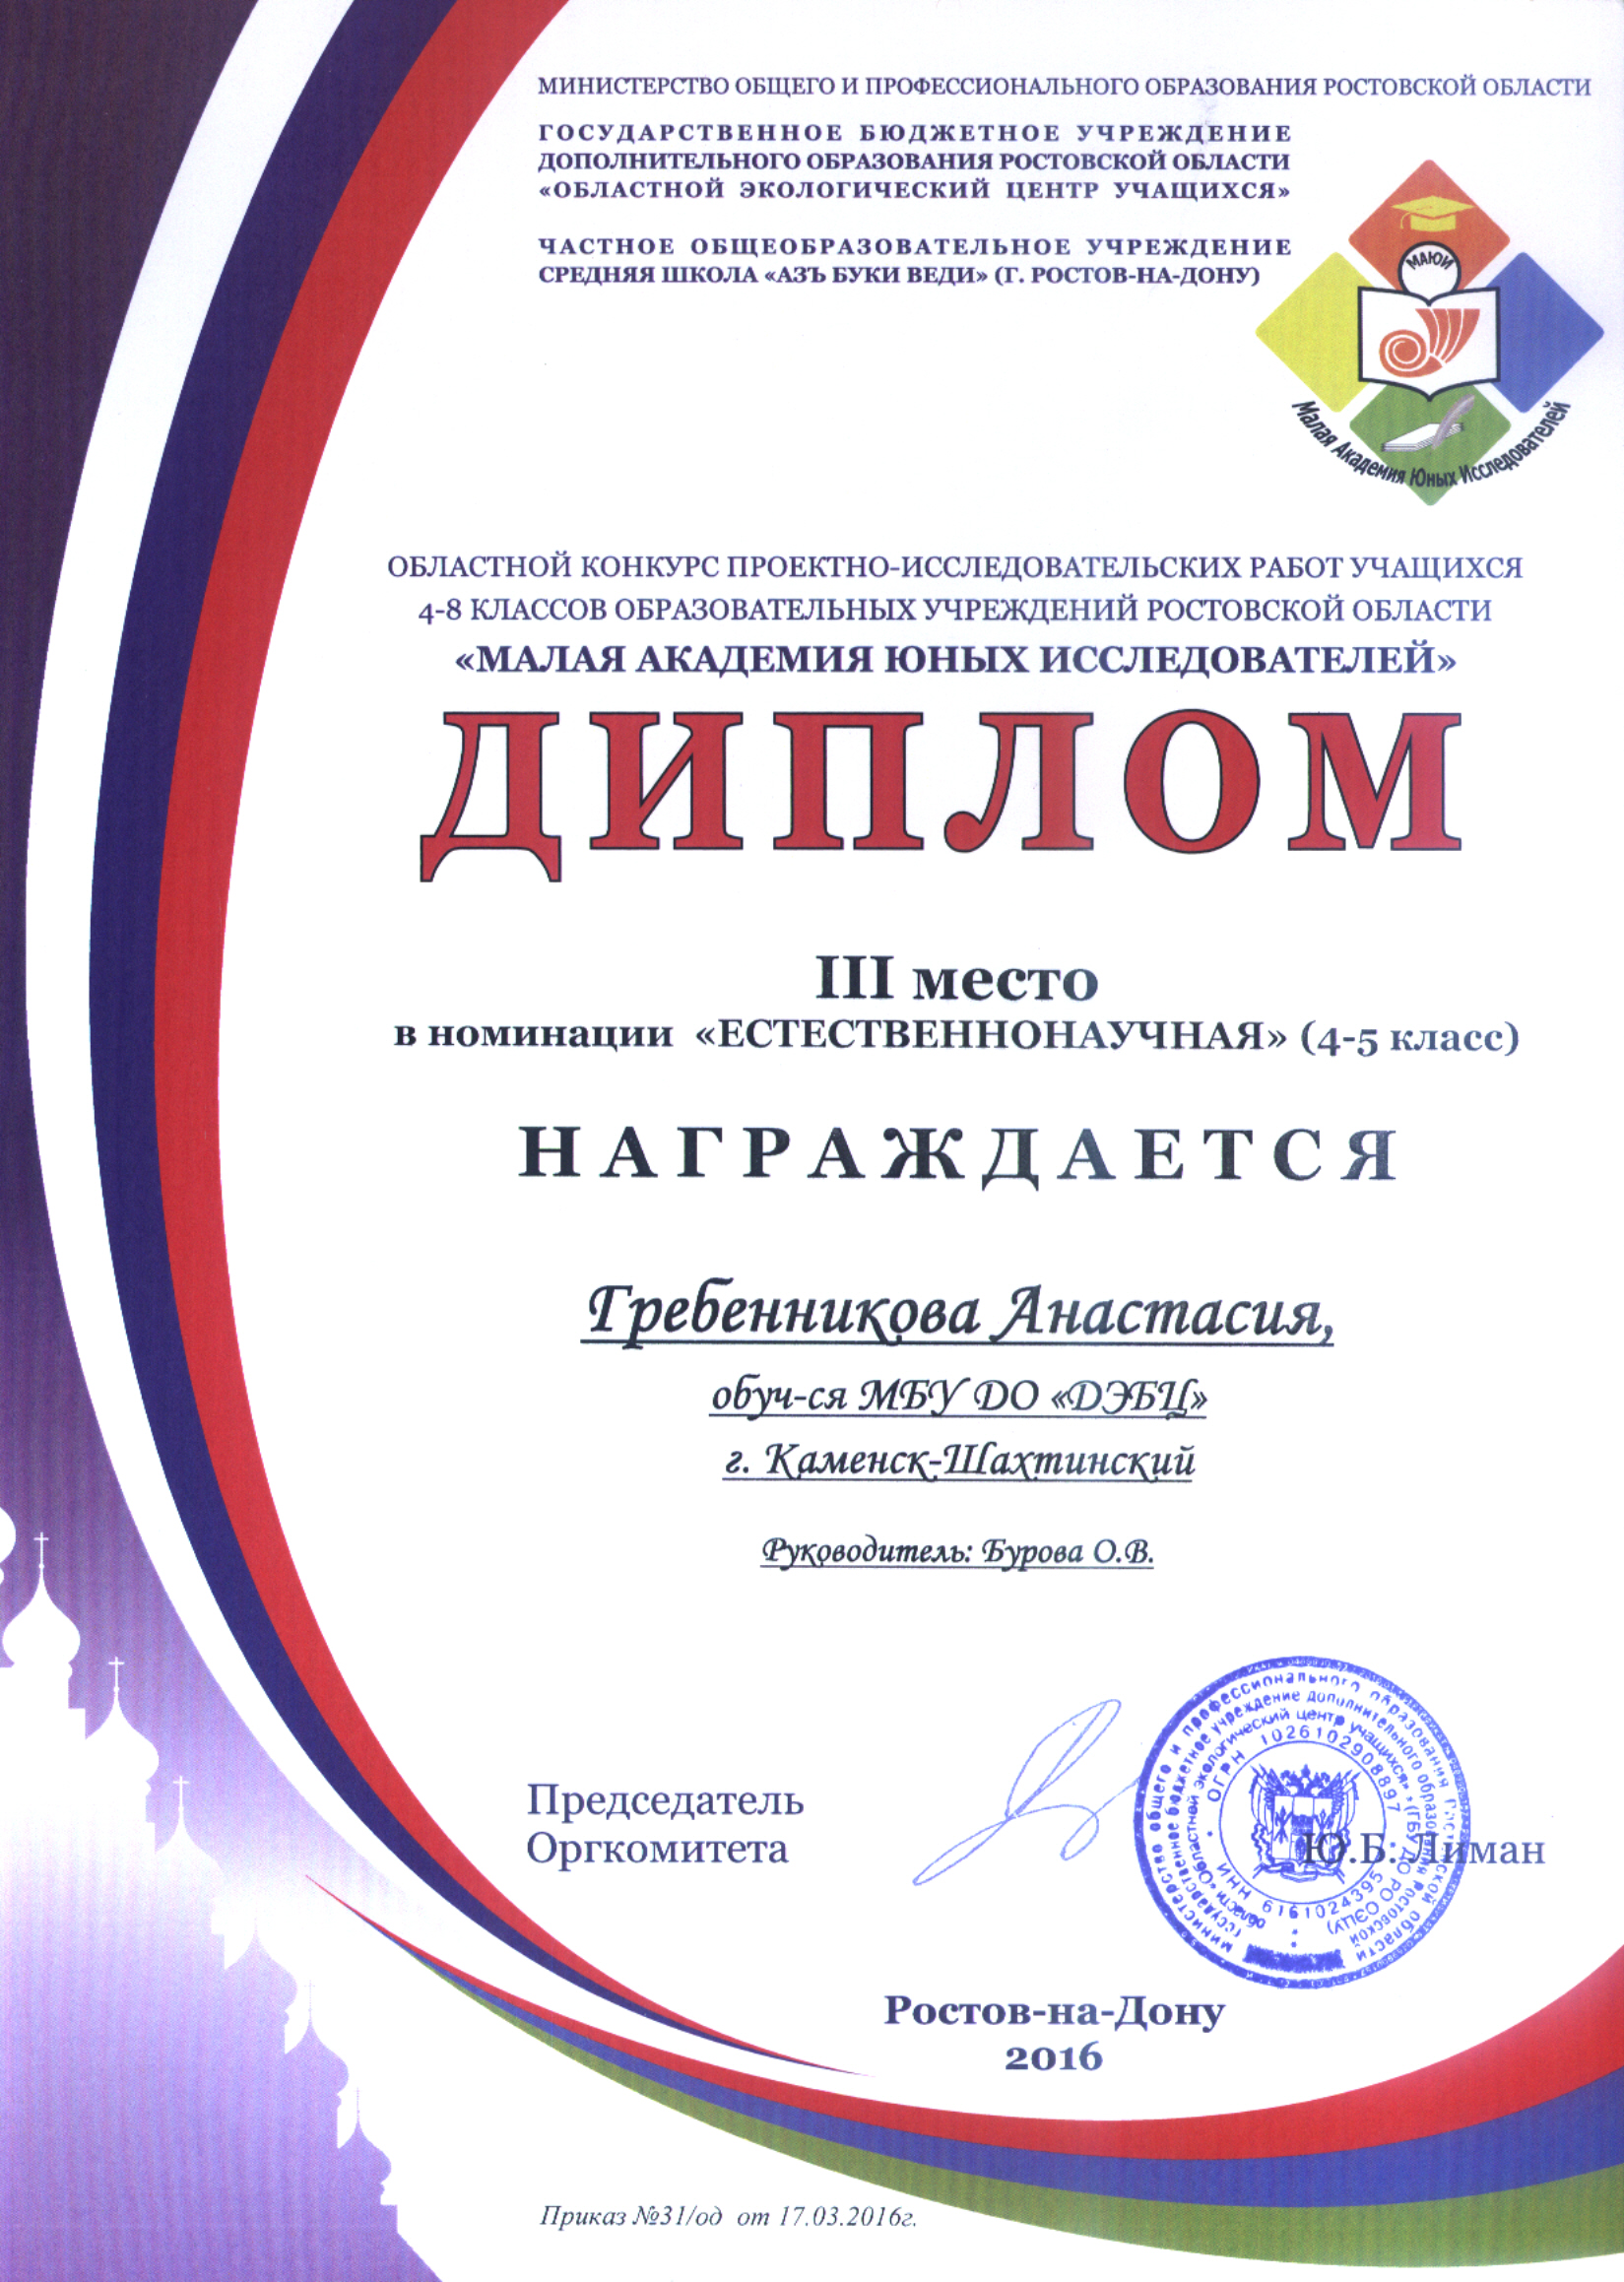 Гребенникова Анастасия